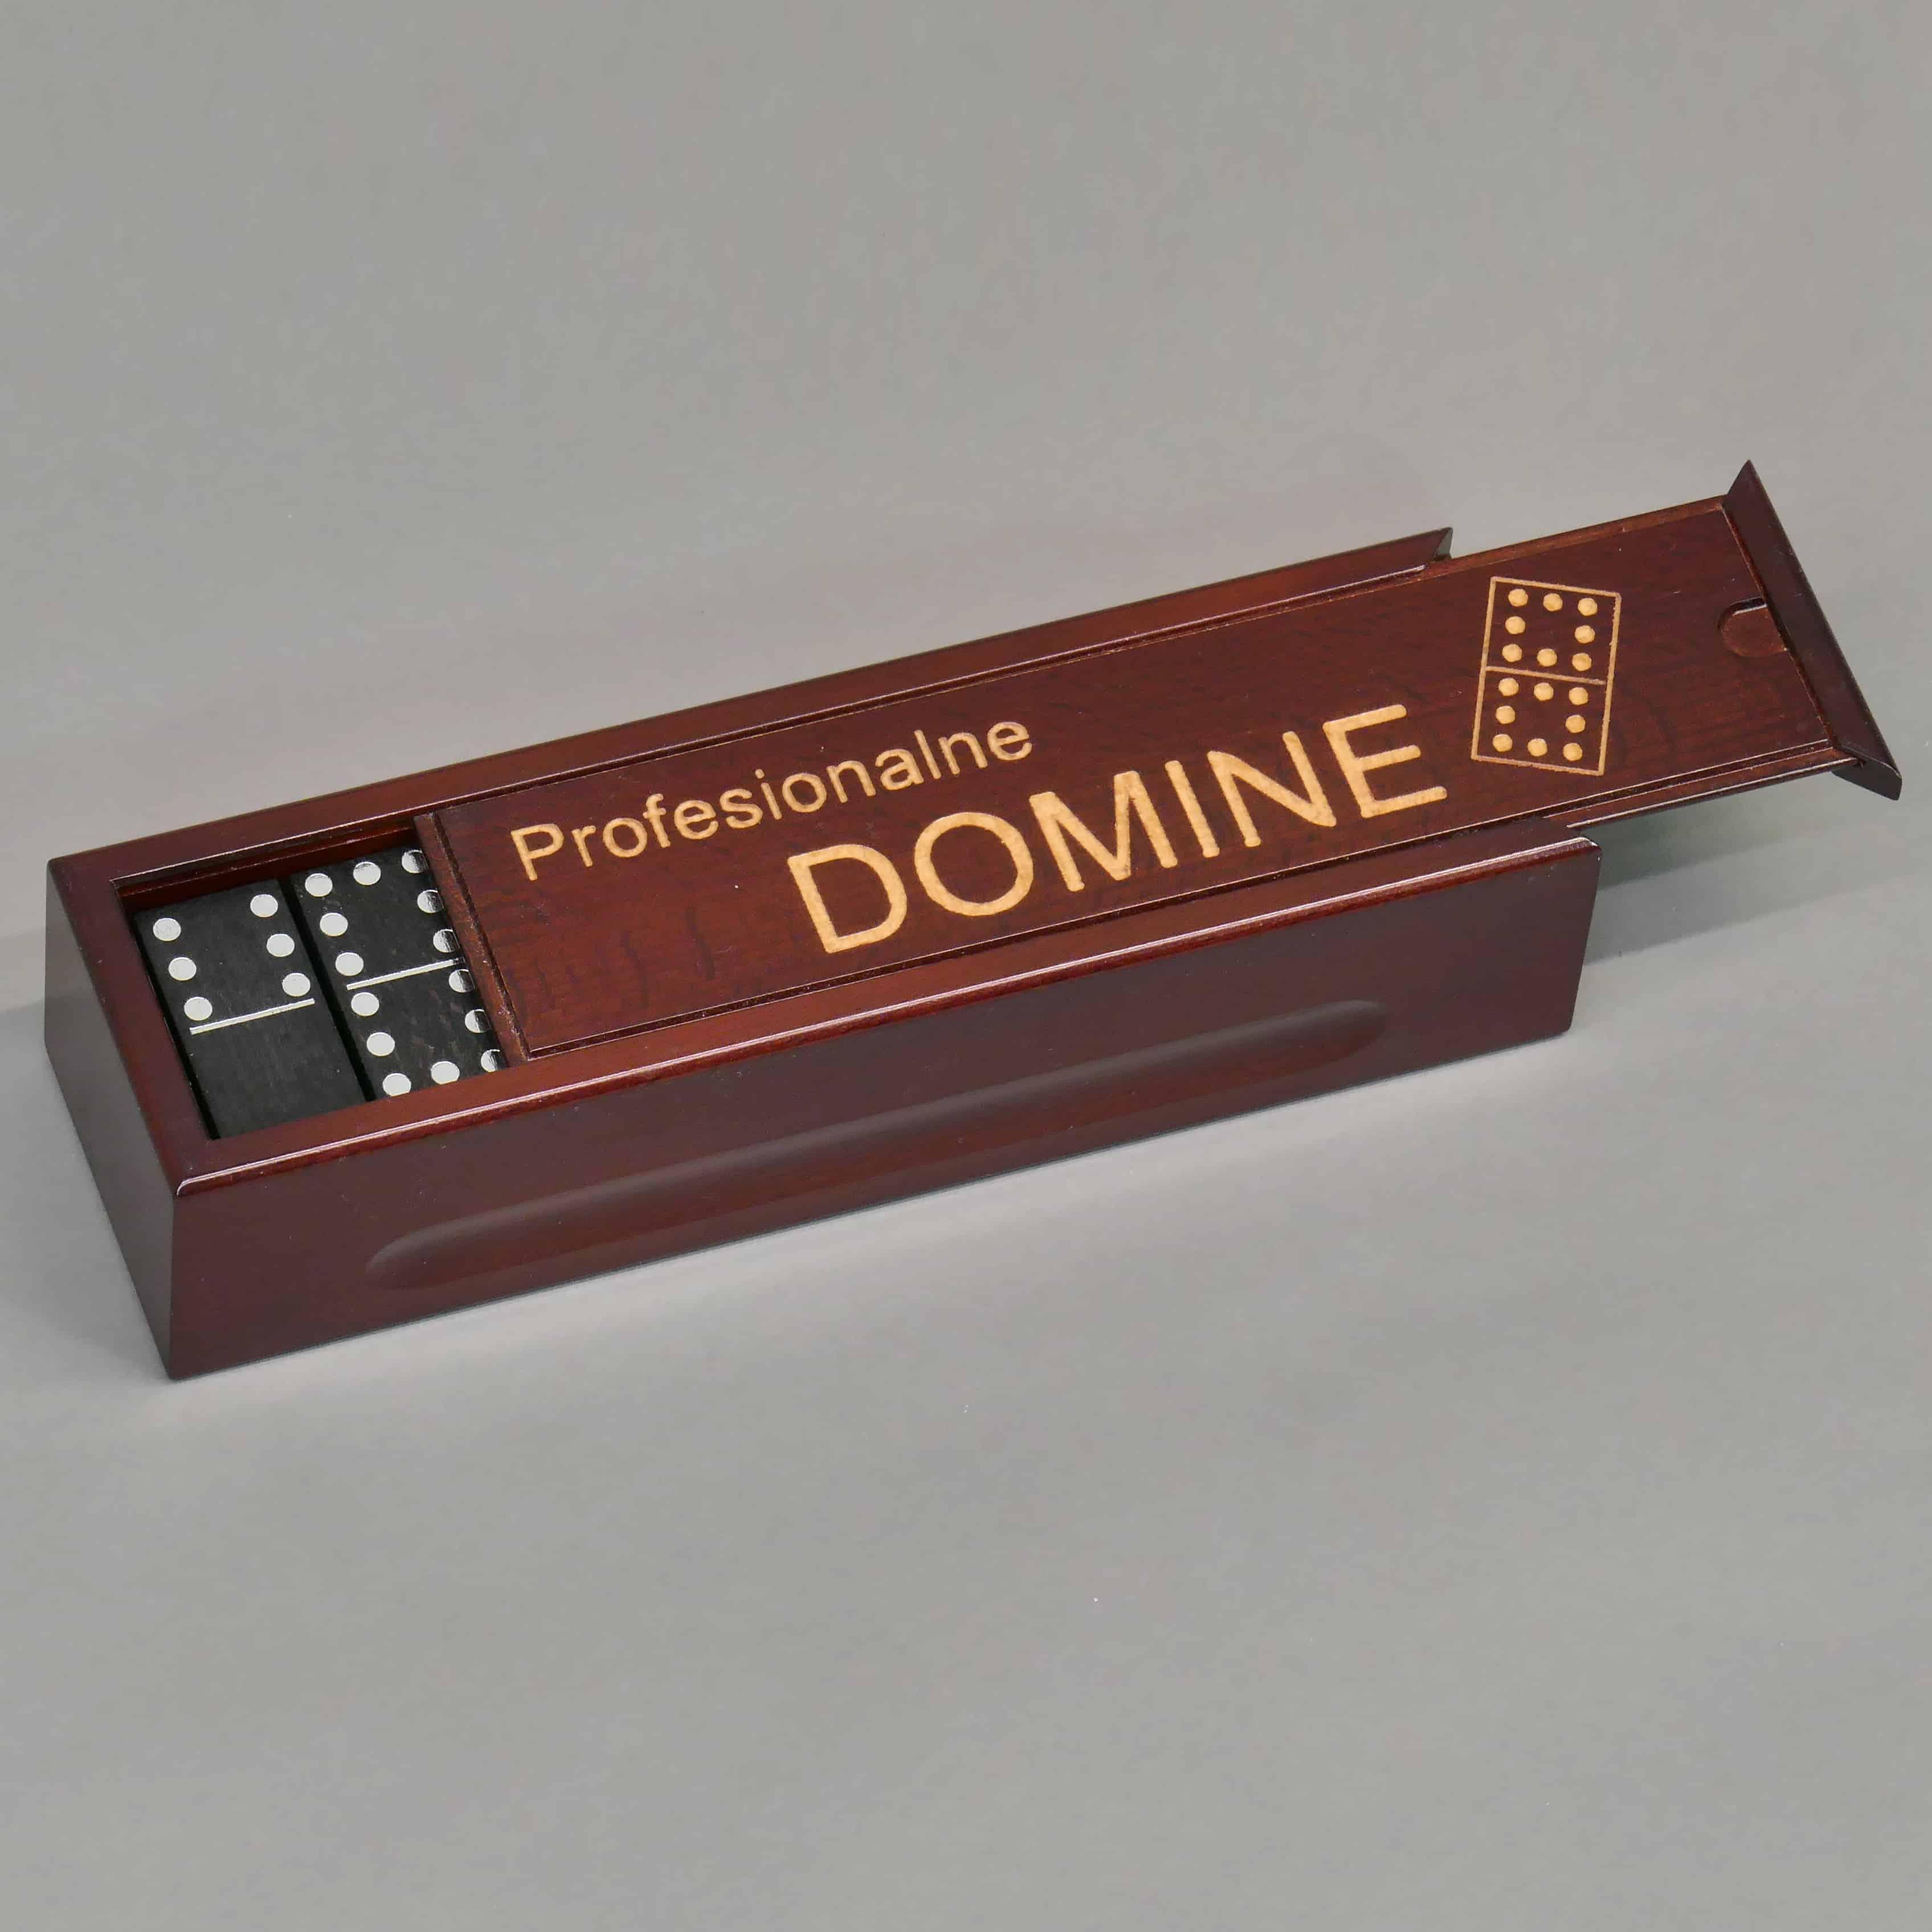 Profesionalne_domine_3600,00_1